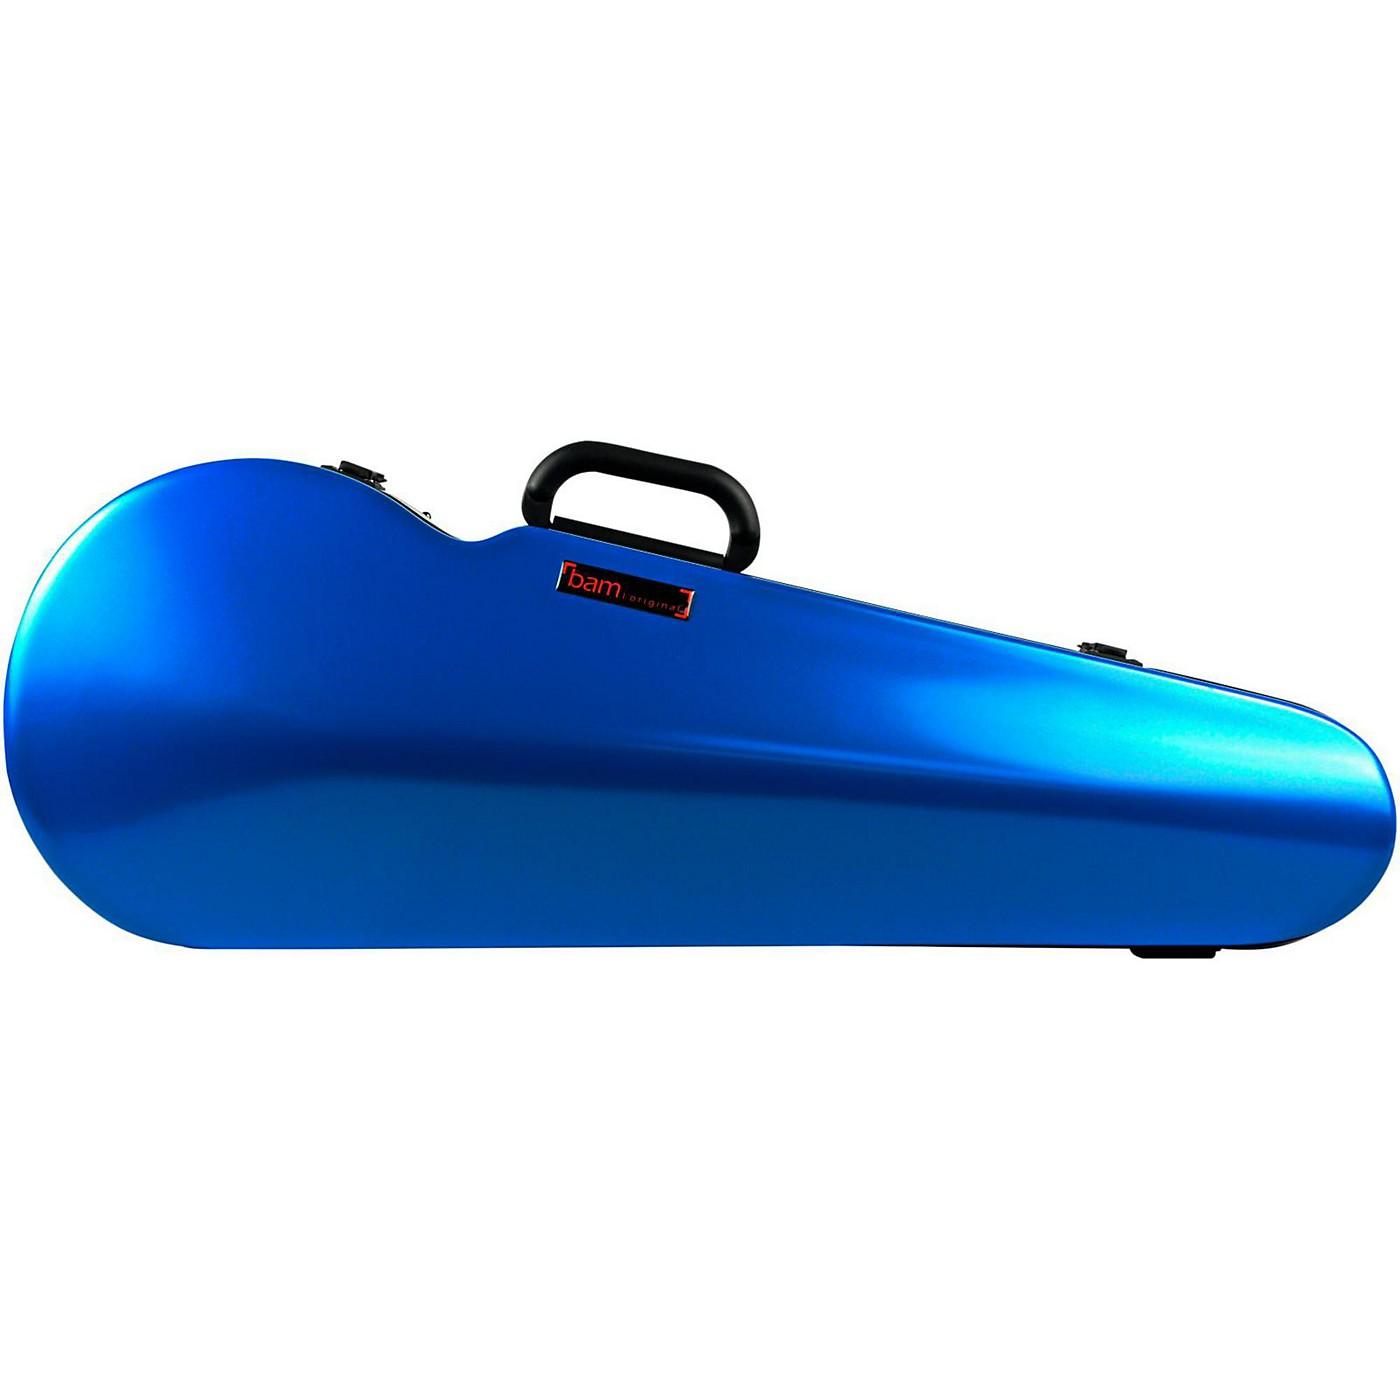 Bam 2200XL Contoured Hightech Adjustable Viola Case thumbnail